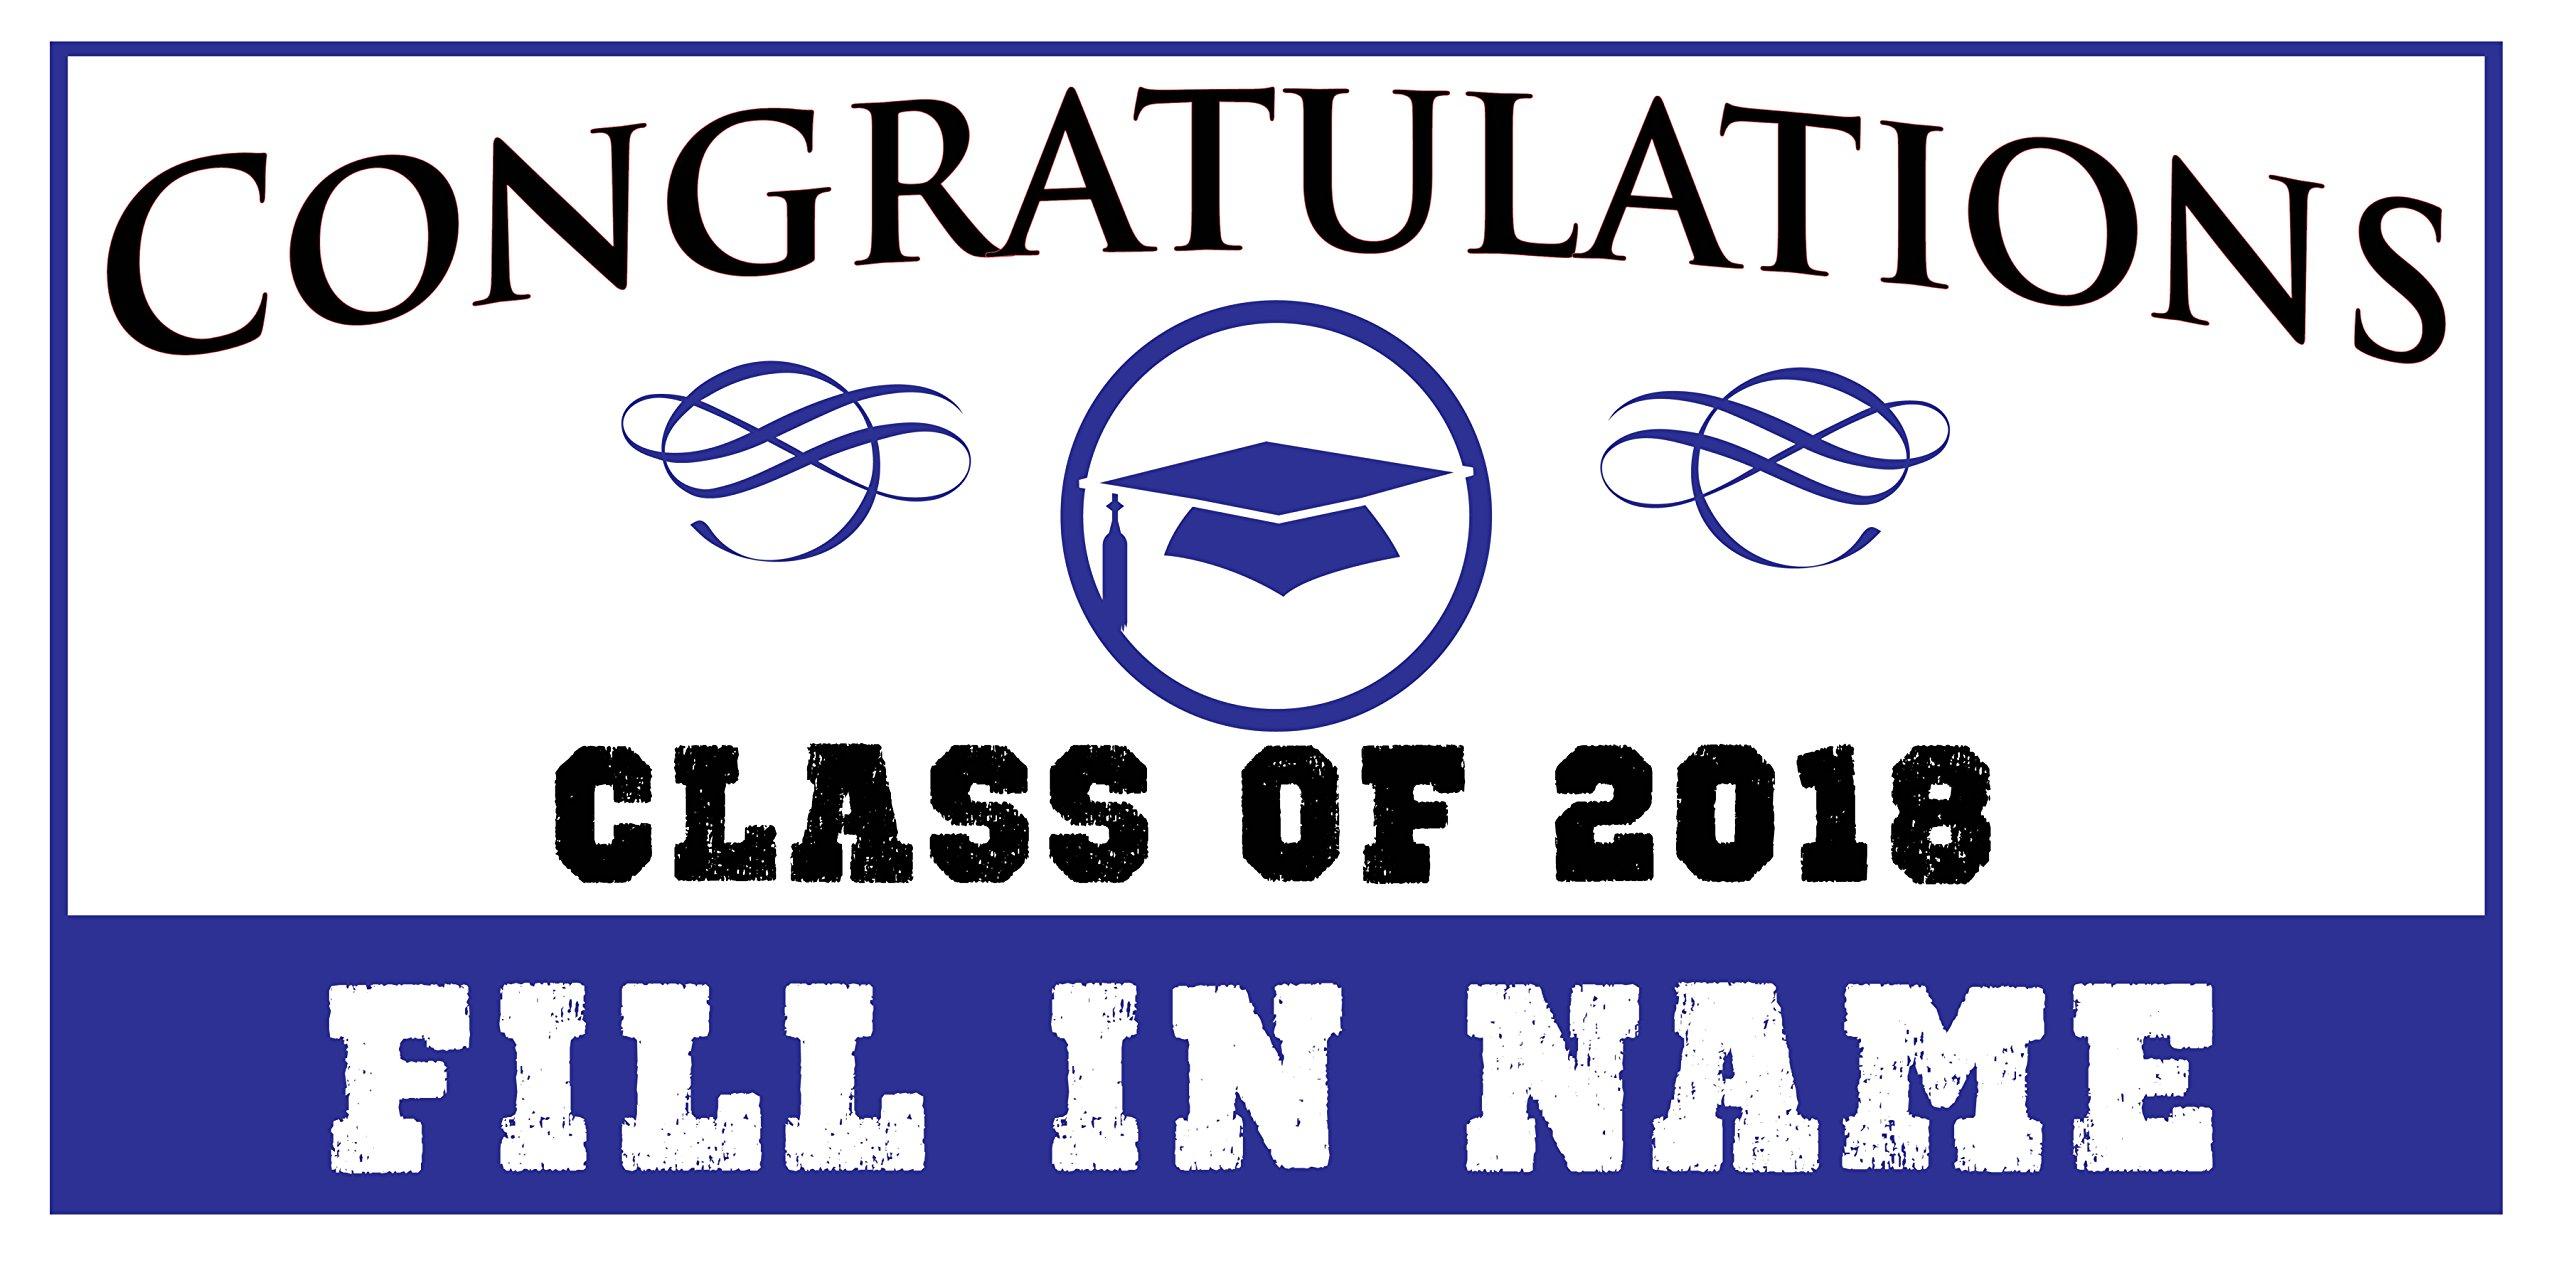 Custom Printed Graduation Banner Congratulations - Hat Blue (10' x 5')